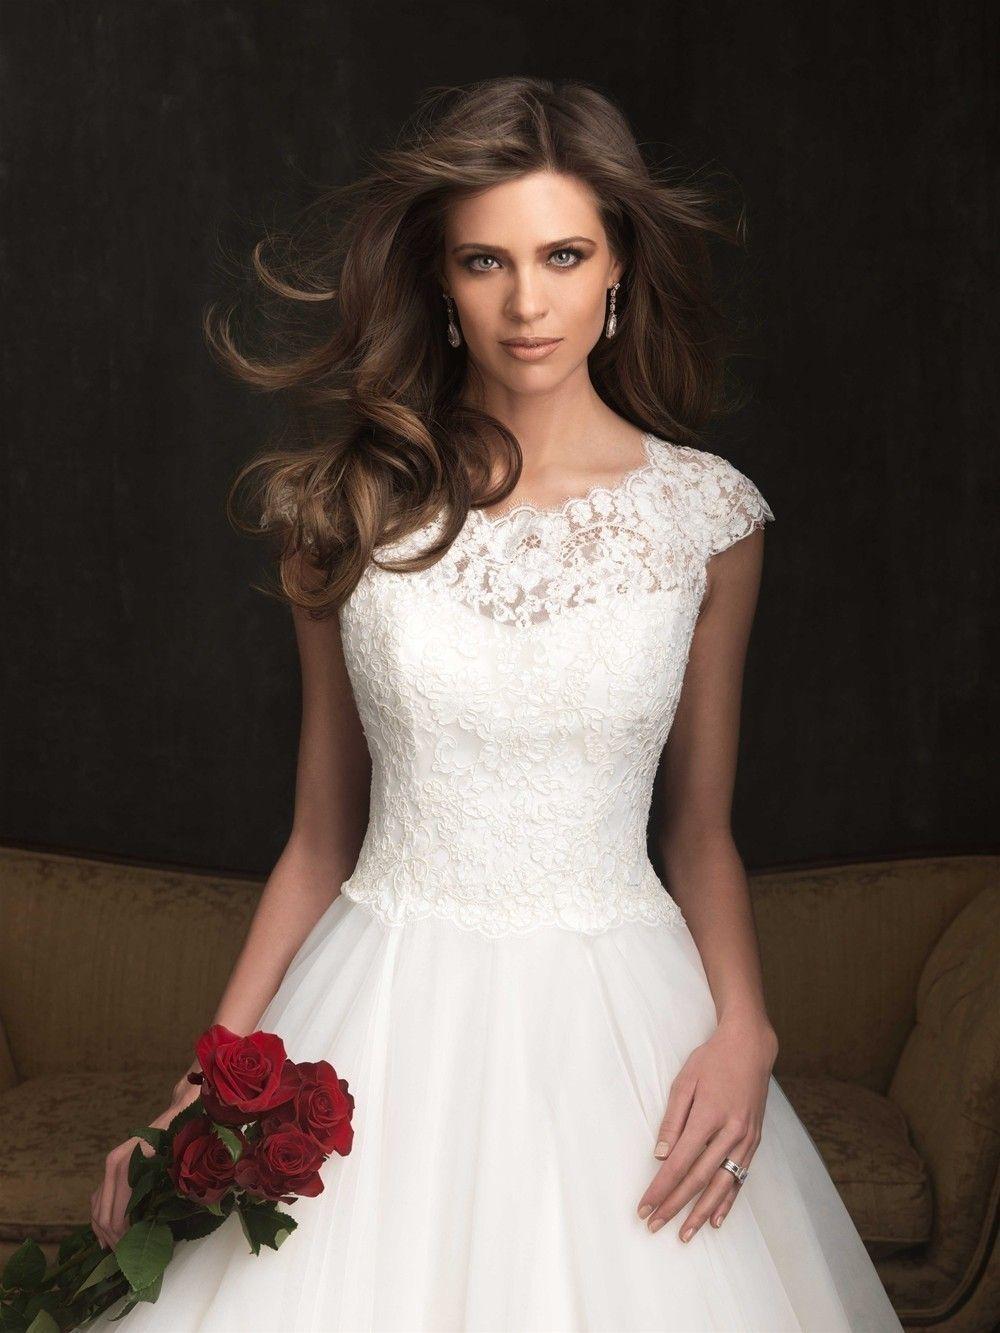 New White Ivory Wedding Dress Custom Size 2 4 6 8 10 12 14 16 18 20 22 2013   db3474a8567f